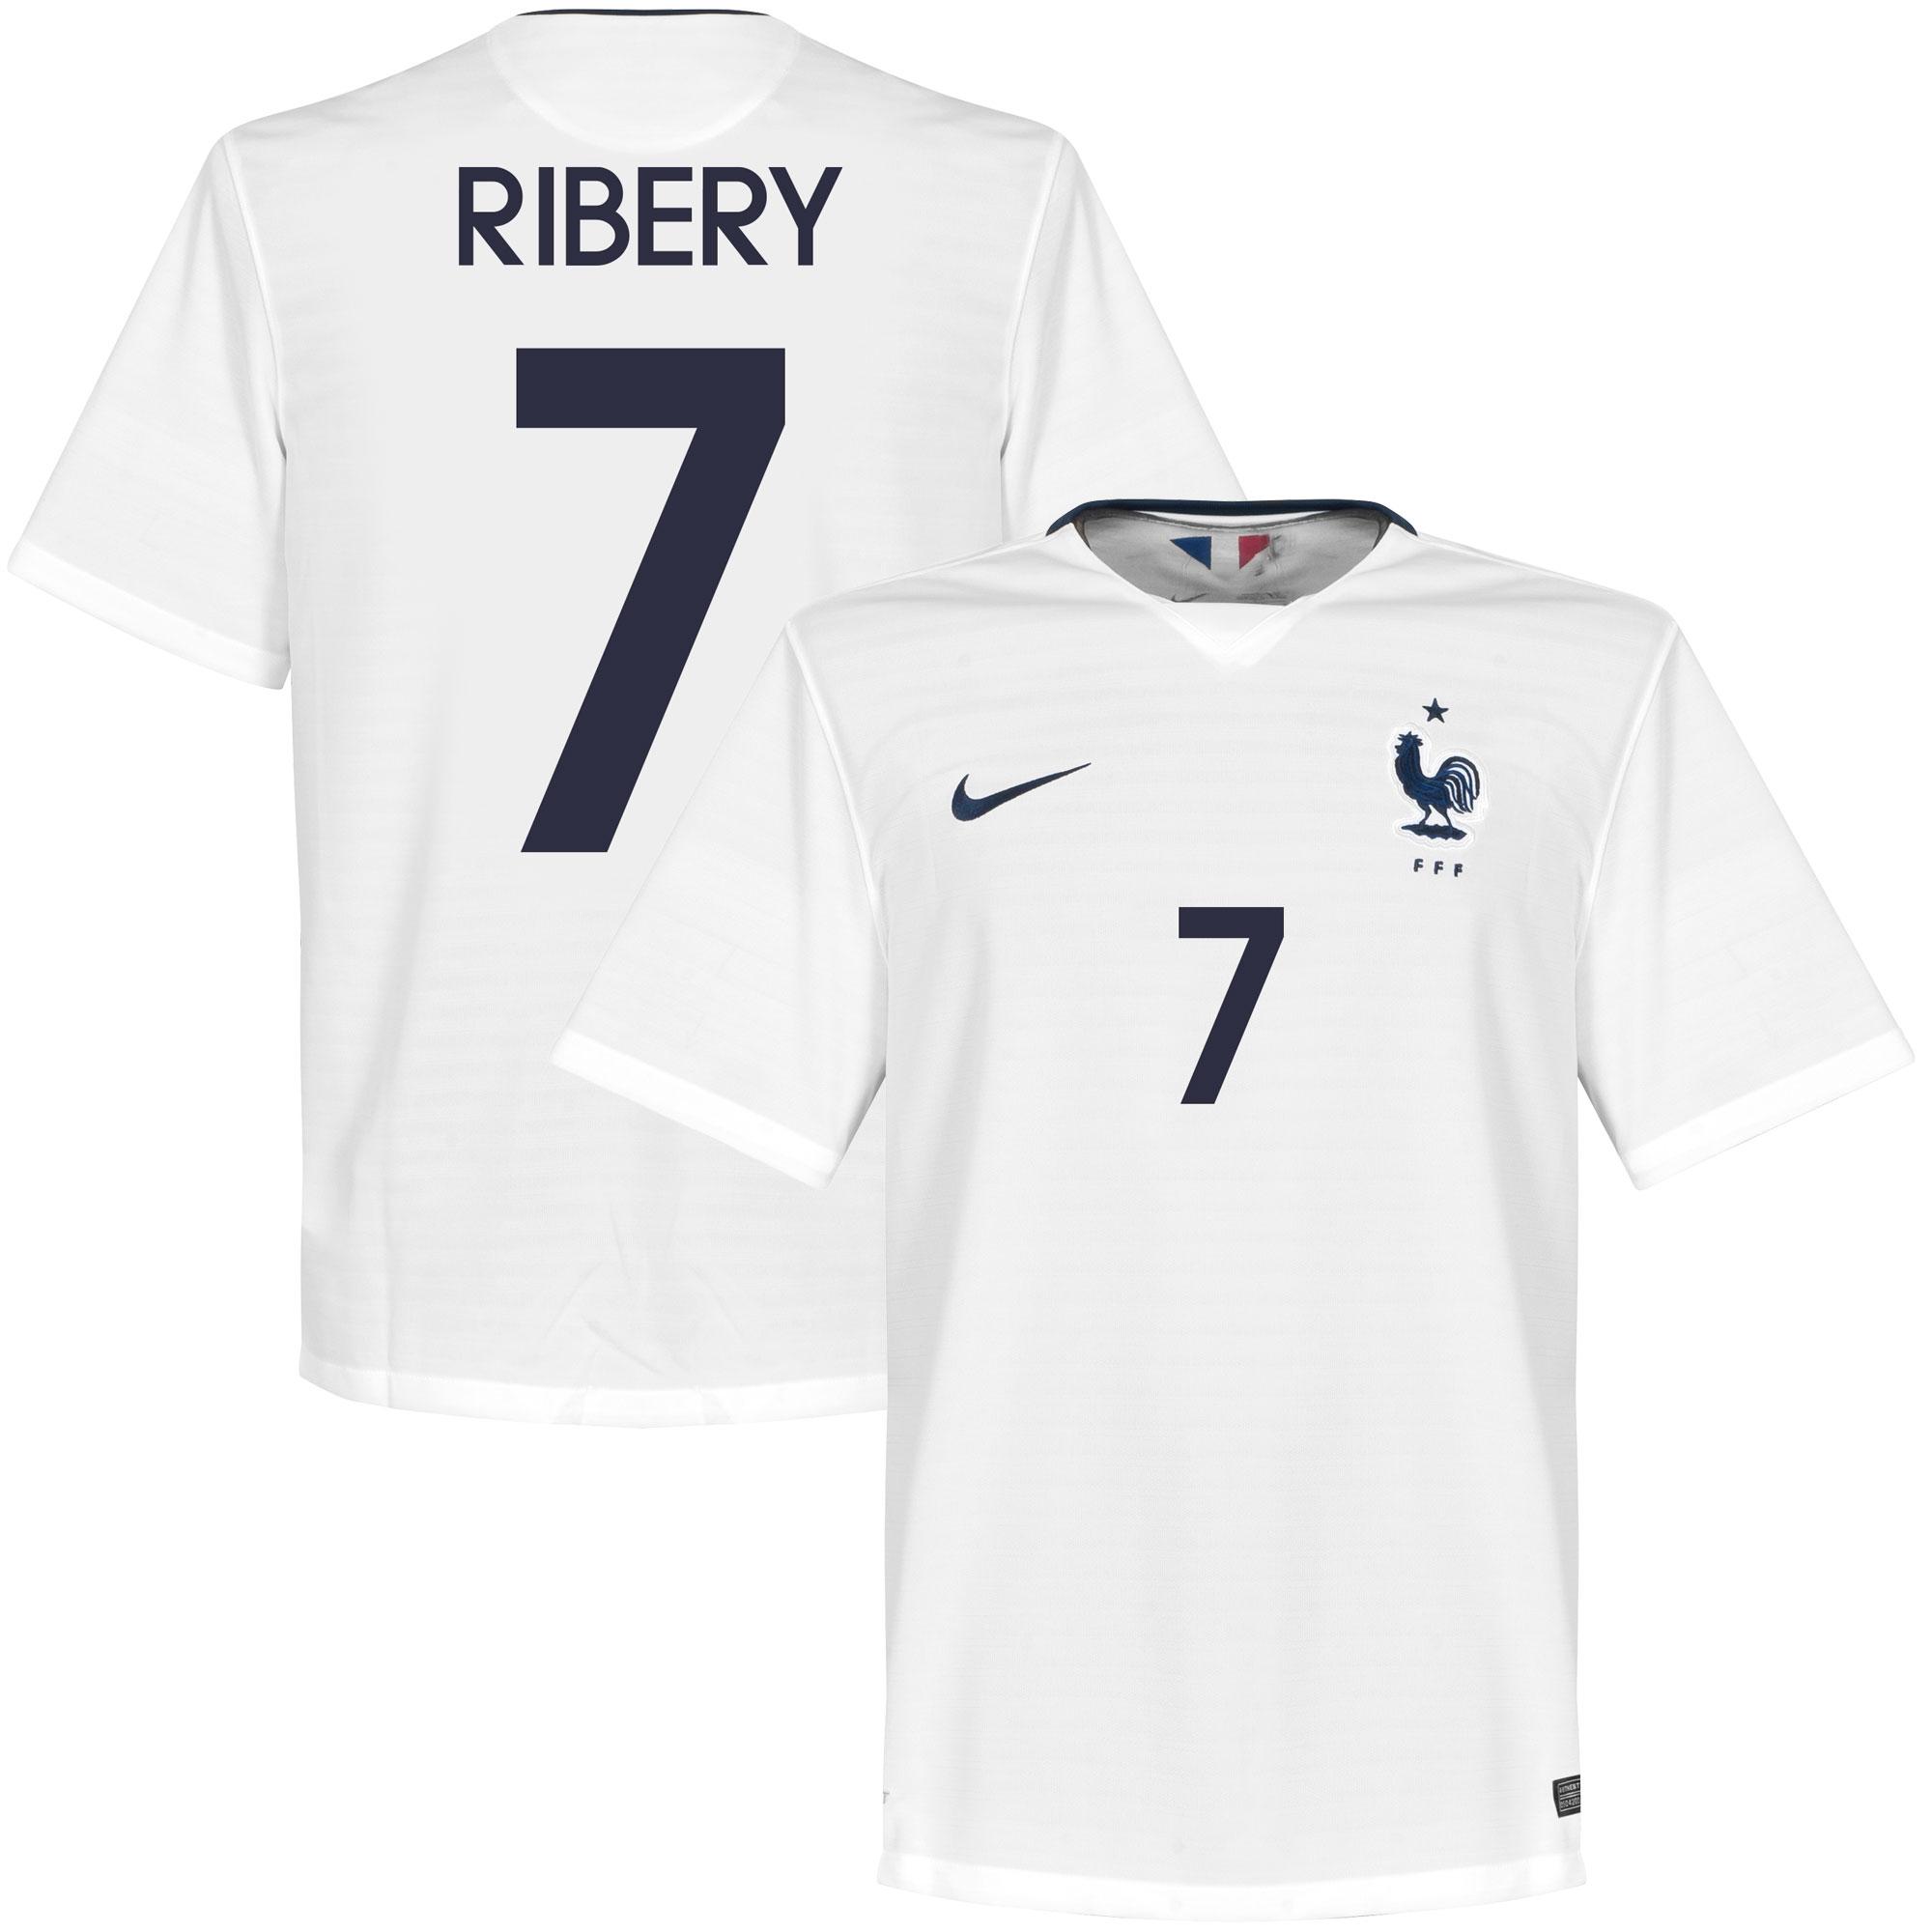 France Away Ribery Jersey 2015 / 2016 (Fan Style Printing) - XXL